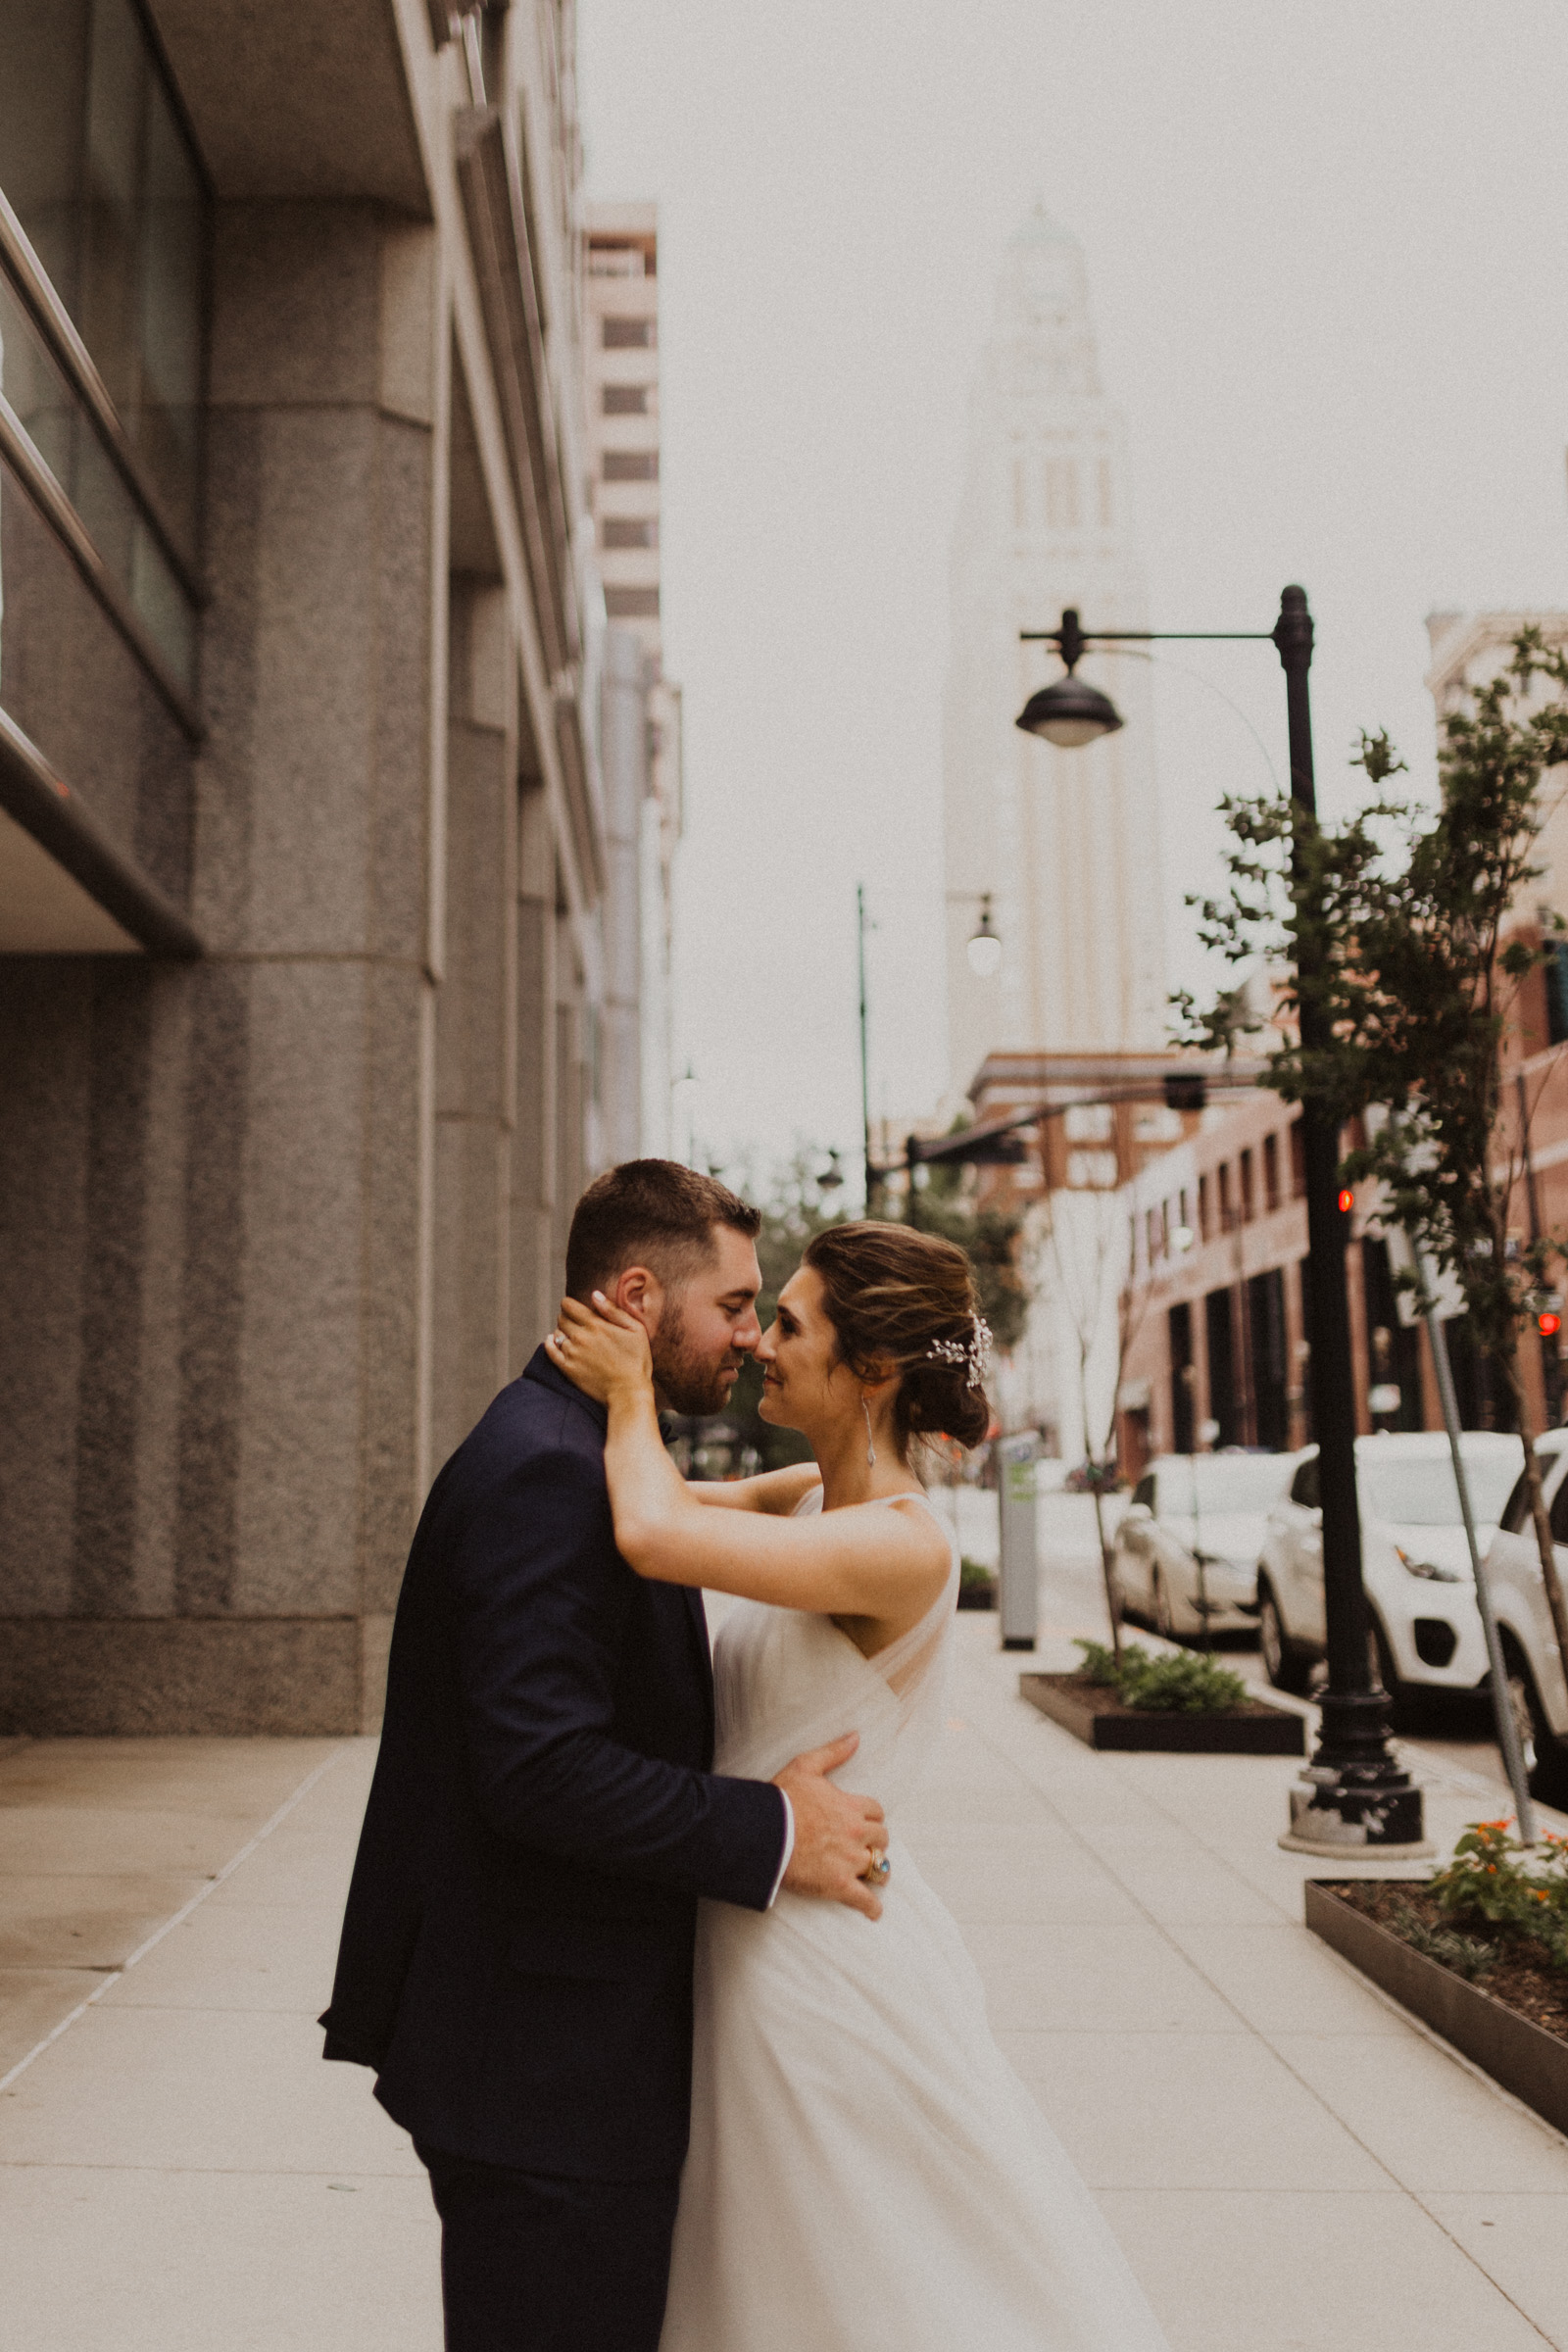 alyssa barletter photography classic downtown kansas city wedding boulevard brewery-51.jpg